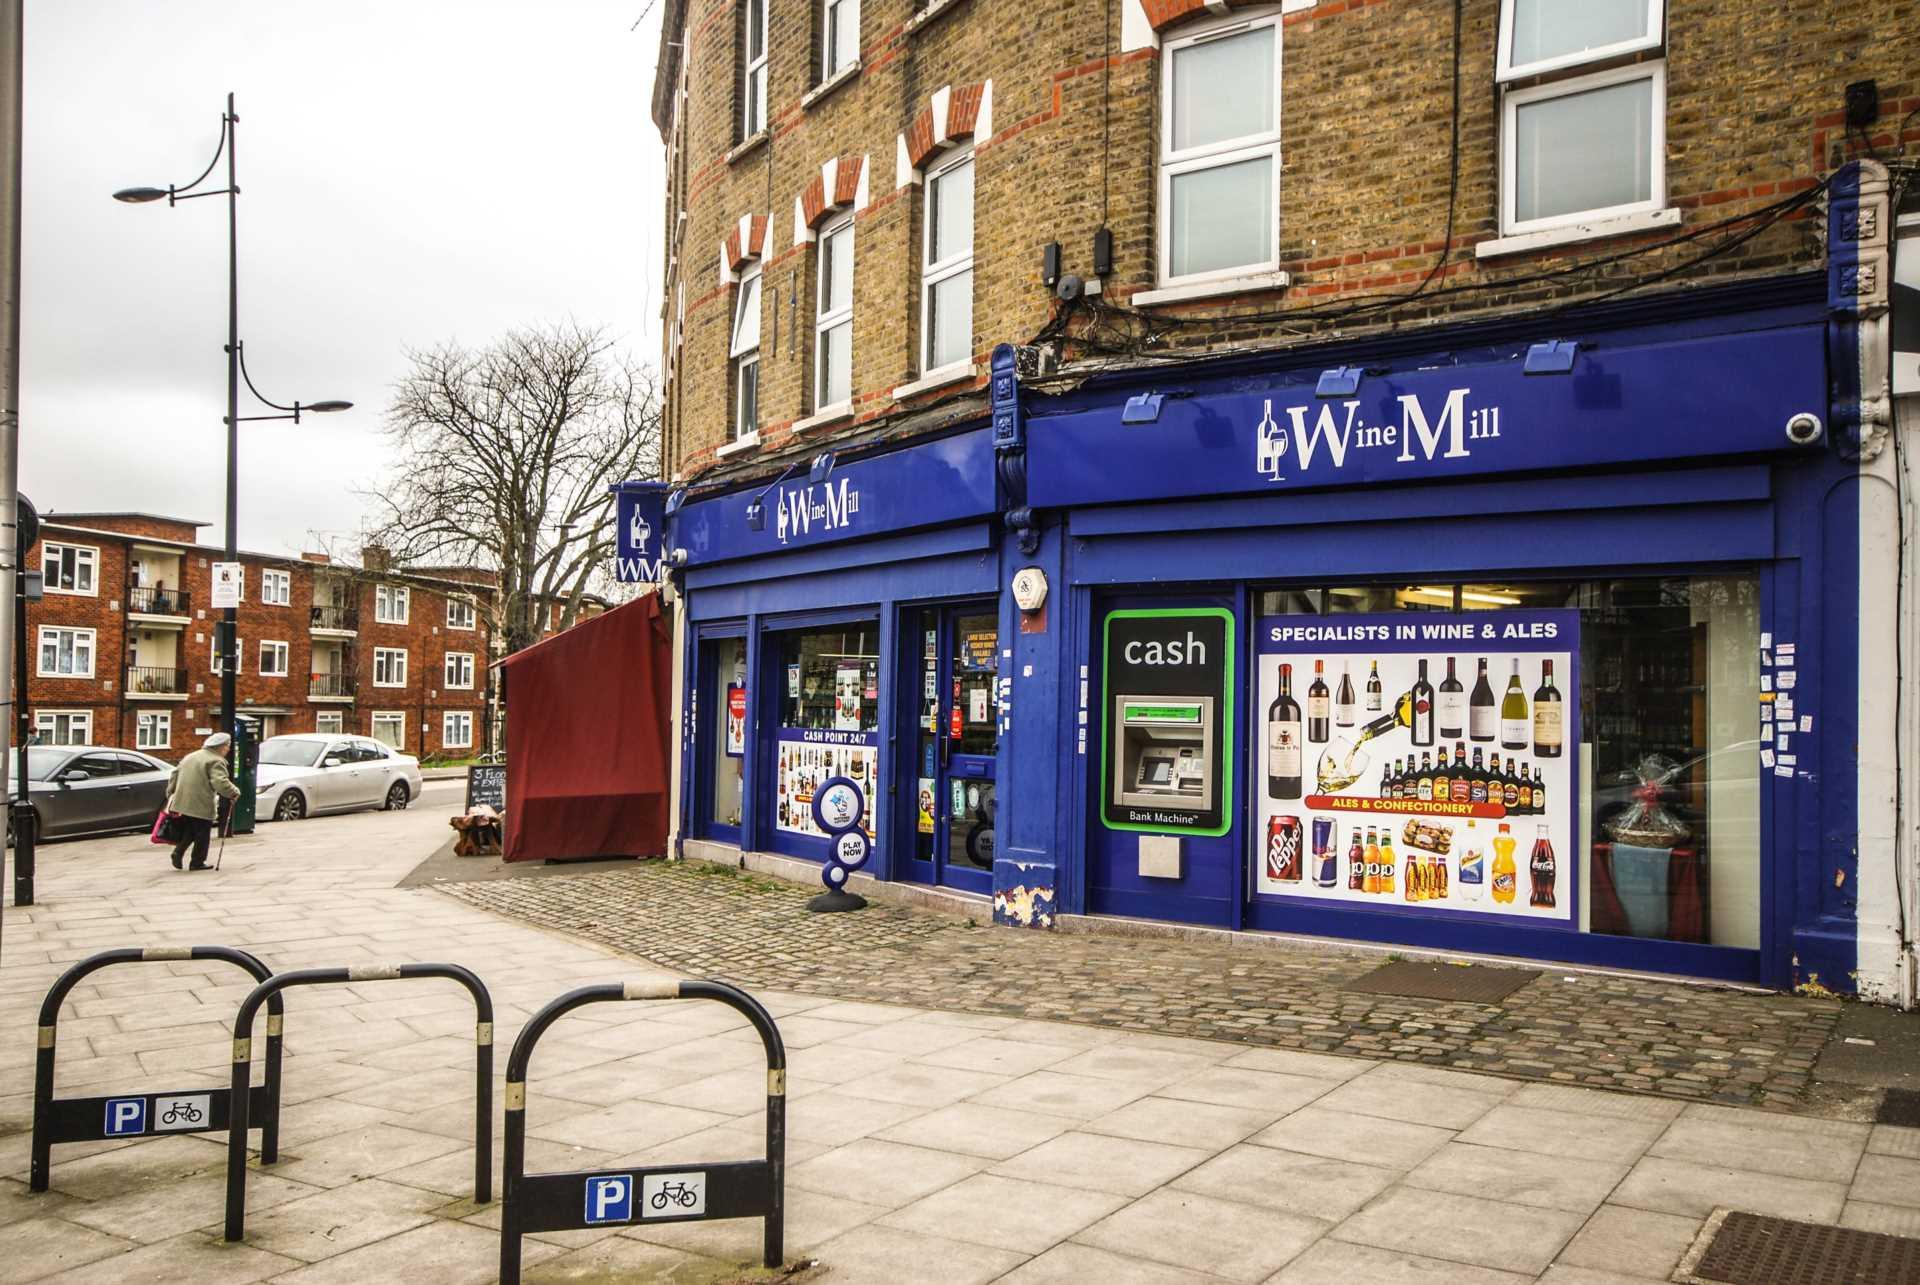 High Road Woodford Green, London, Image 1